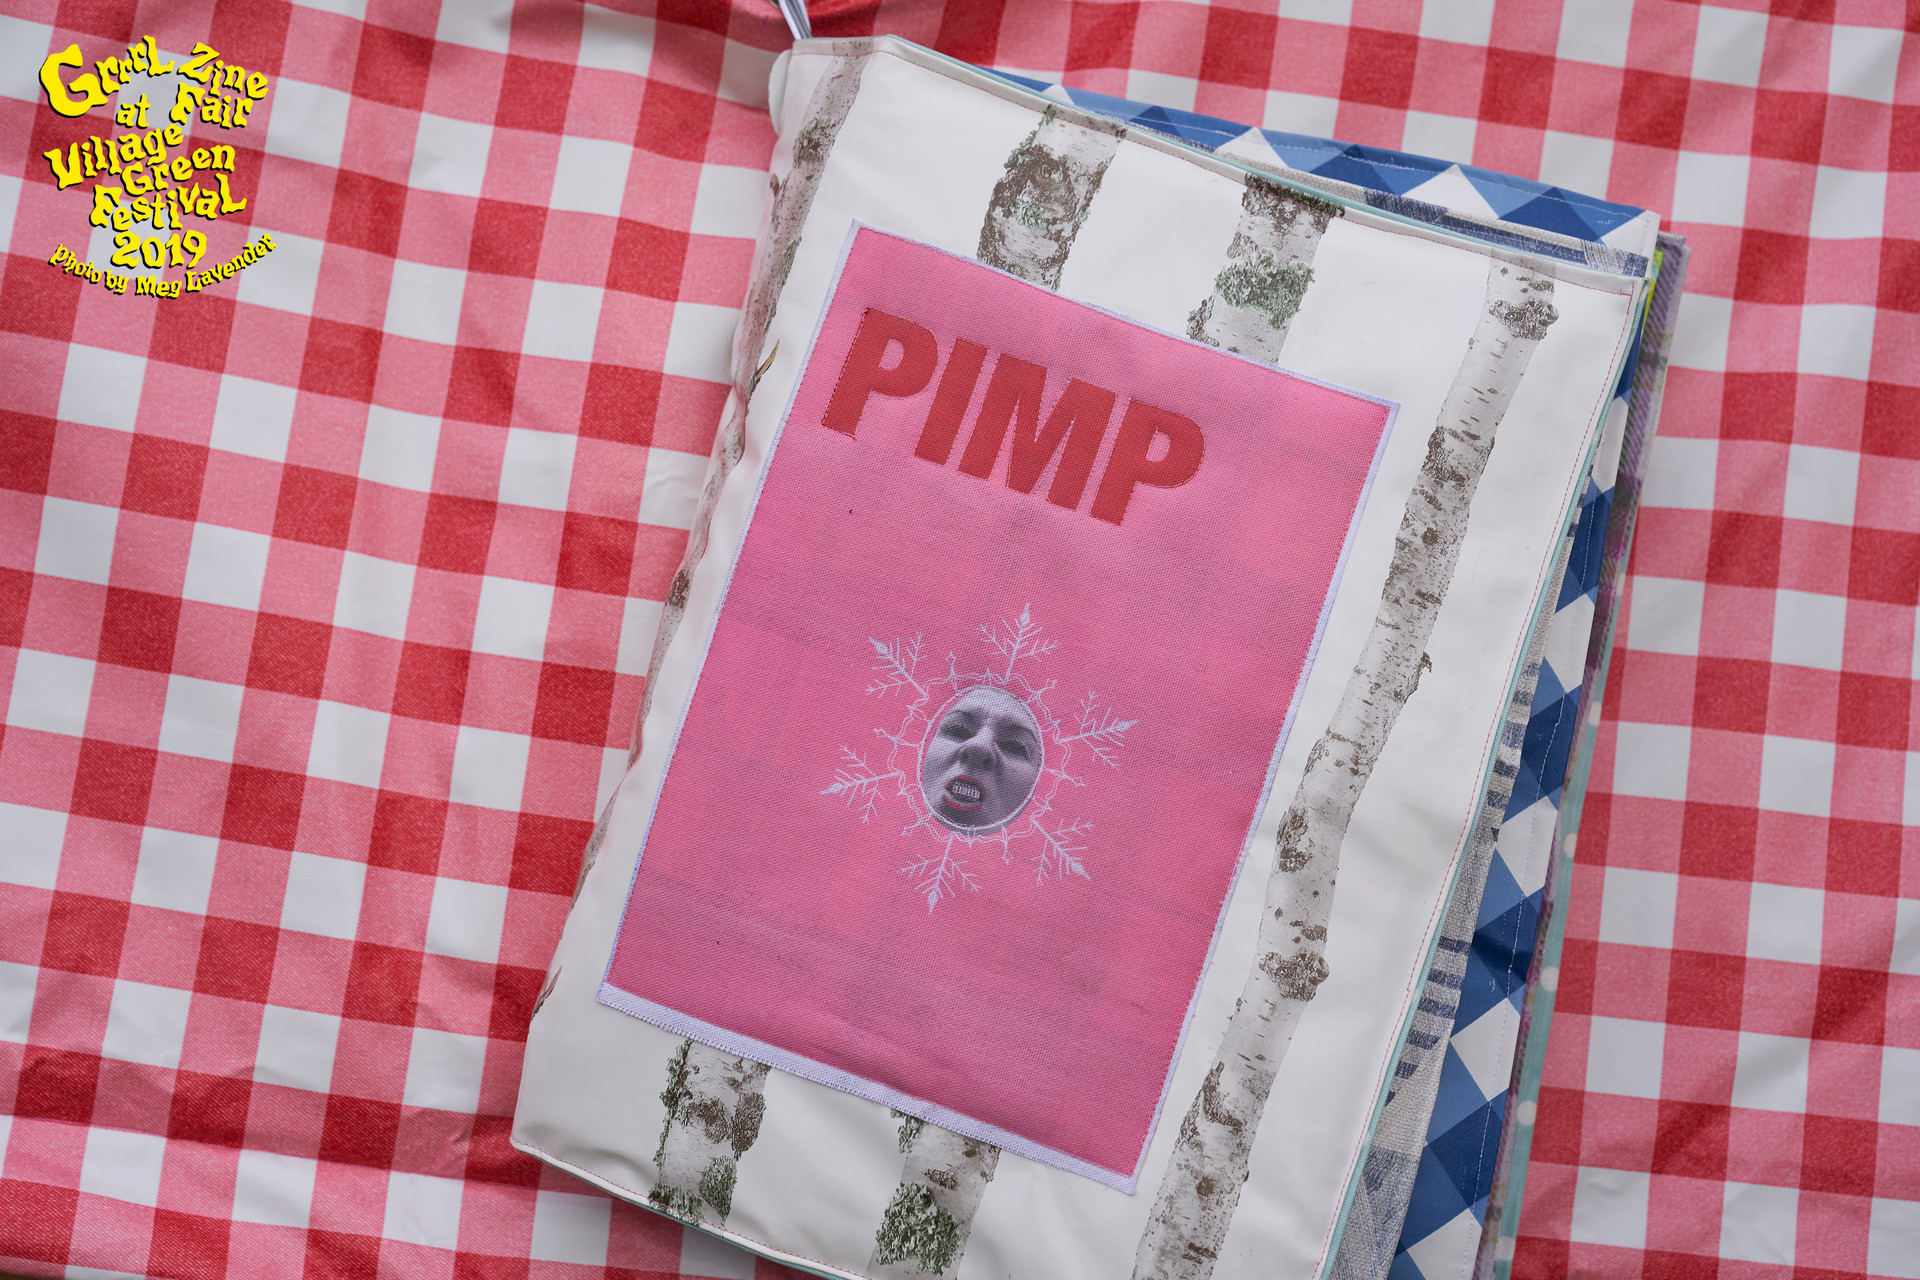 Spread Exhibition PIMP zine Village Gree